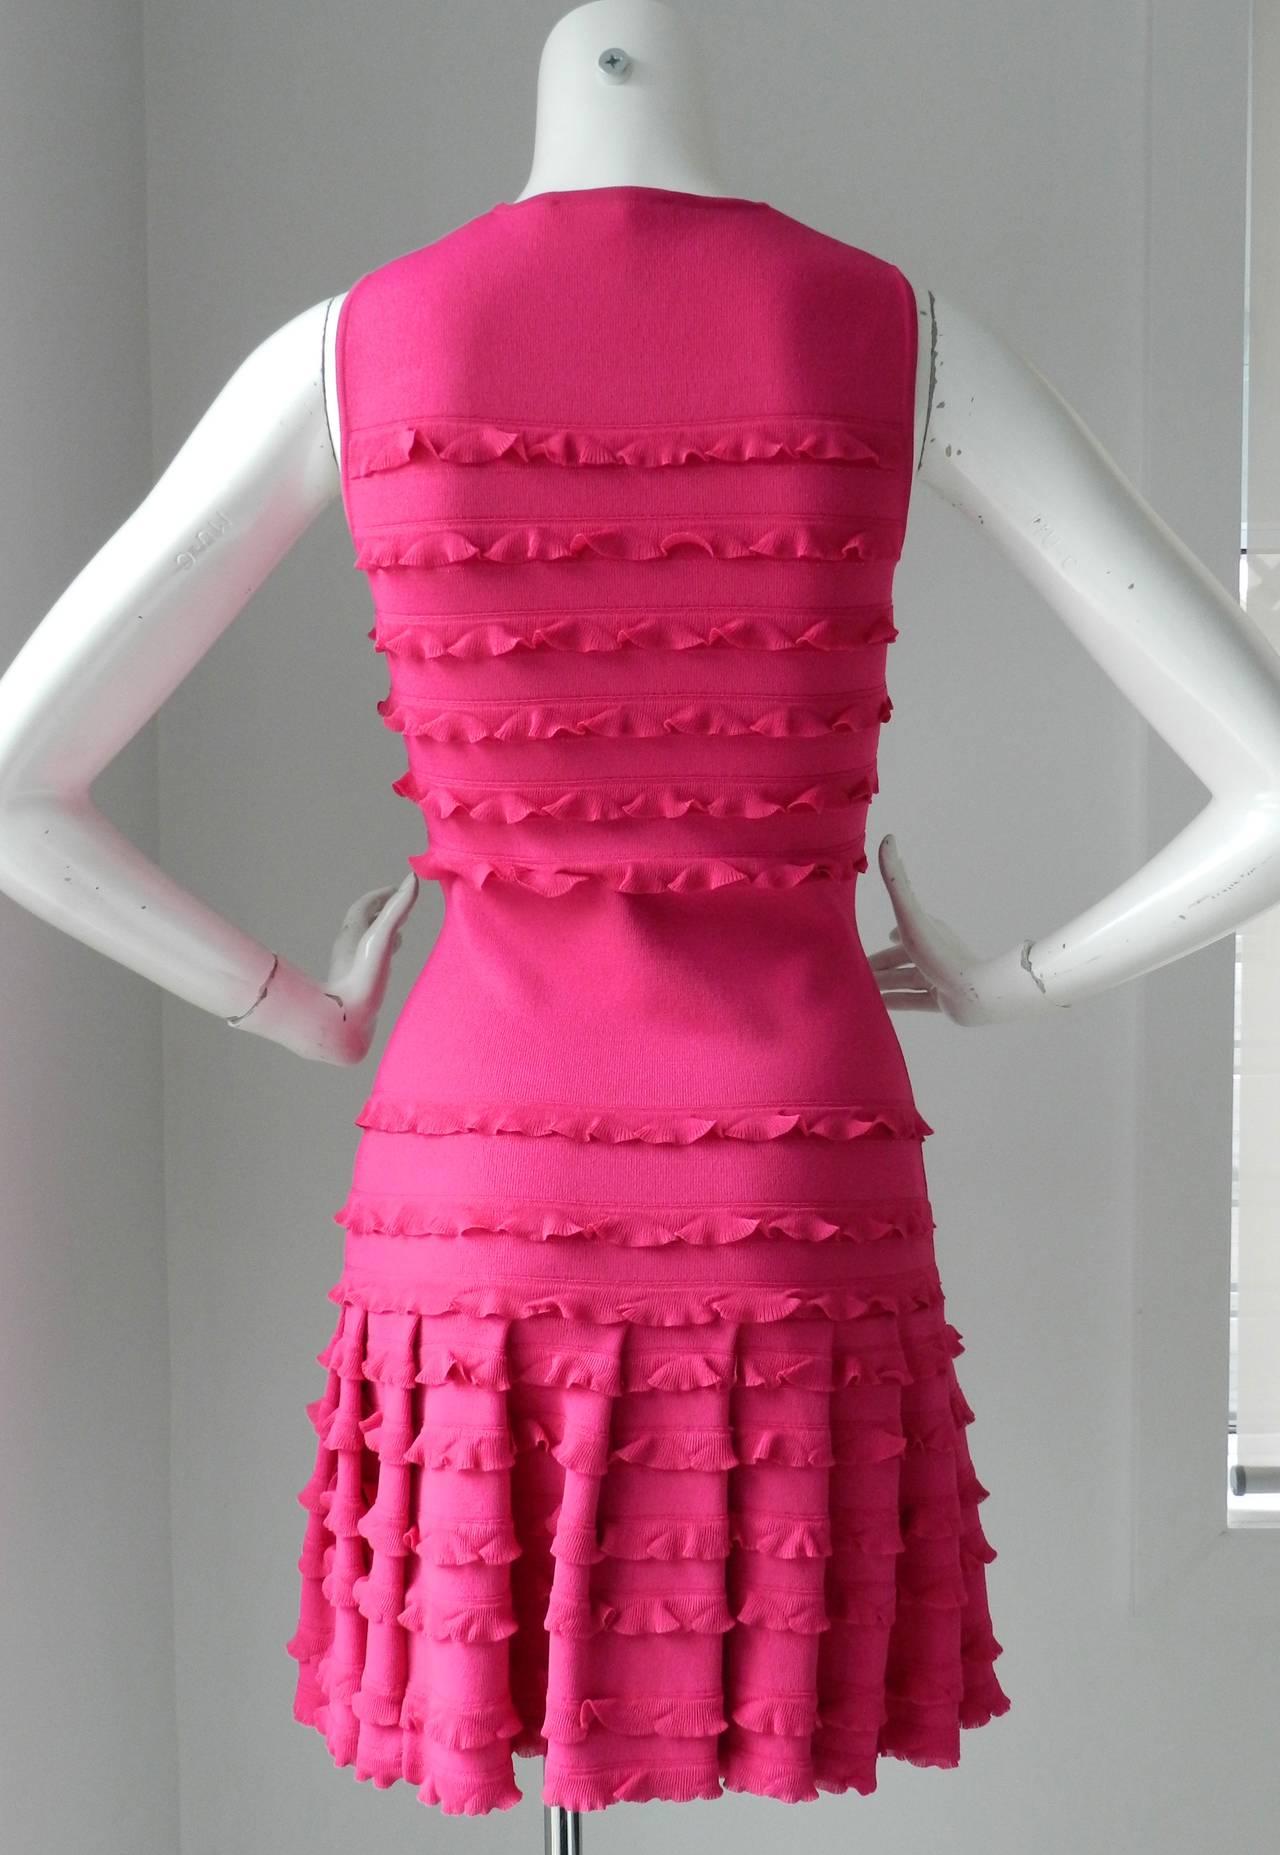 Christian Dior Galliano Hot Fuchsia Jersey Dress 3